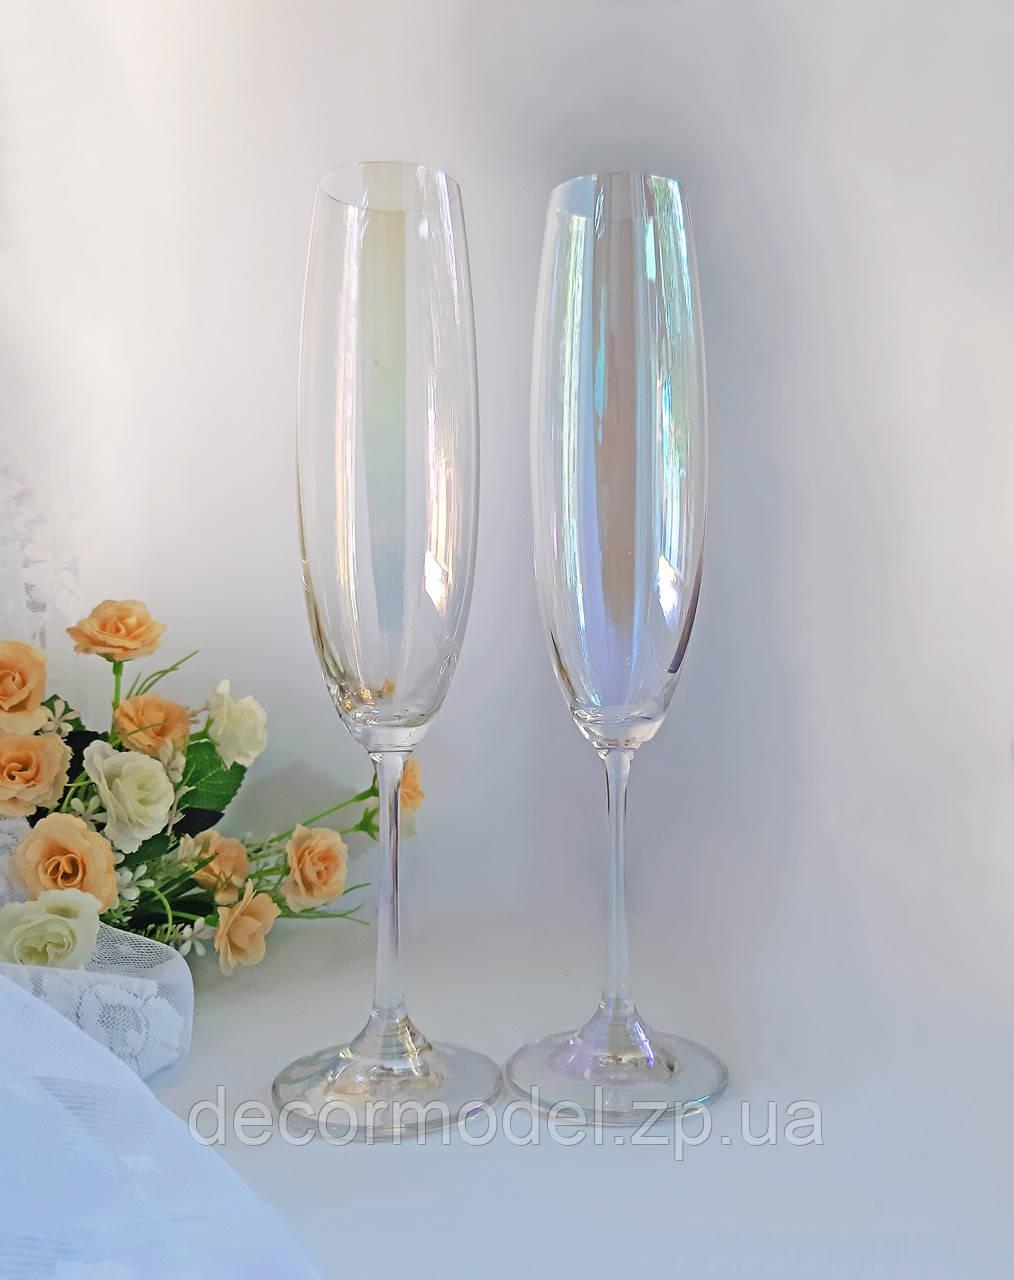 Свадебные бокалы Bohemia Milvus 250 ml (цвет: ПЕРЛАМУТР)